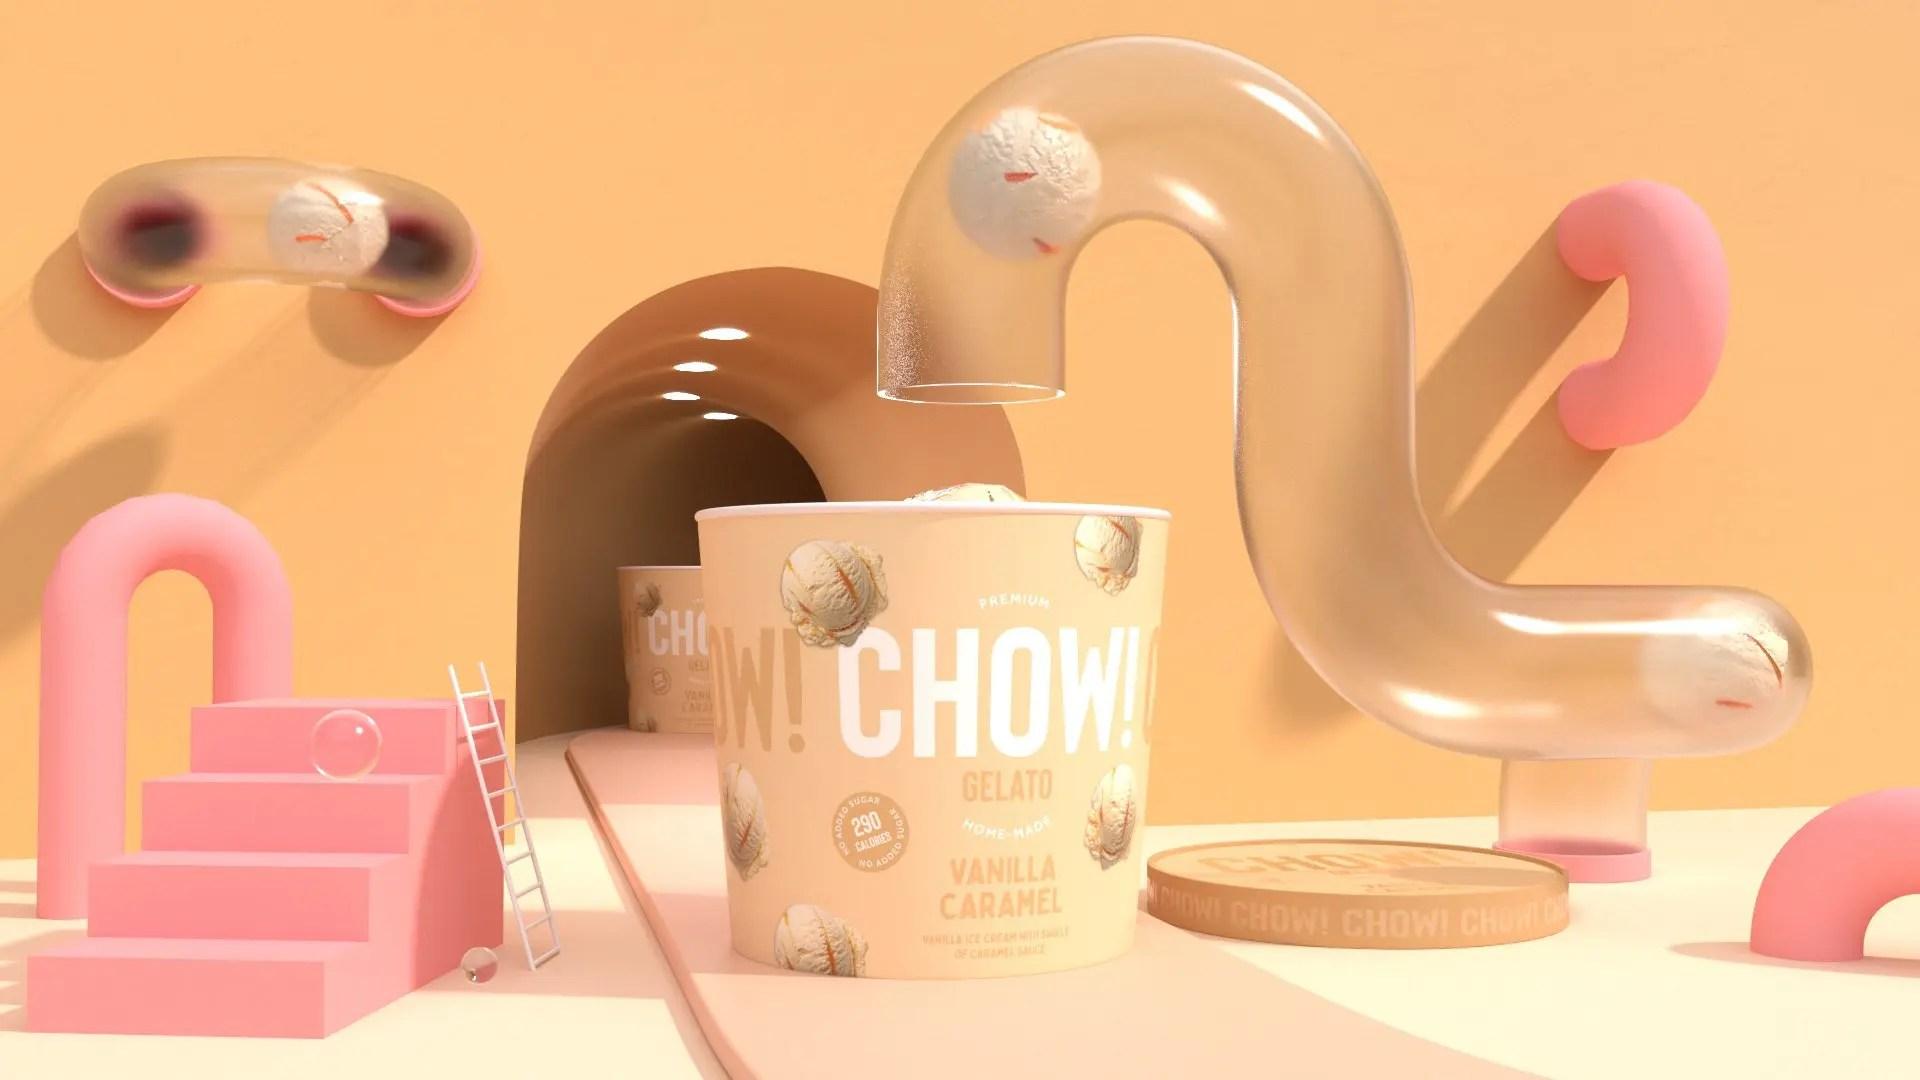 CHOW ICE CREAM 3D VANILLA CARAMEL